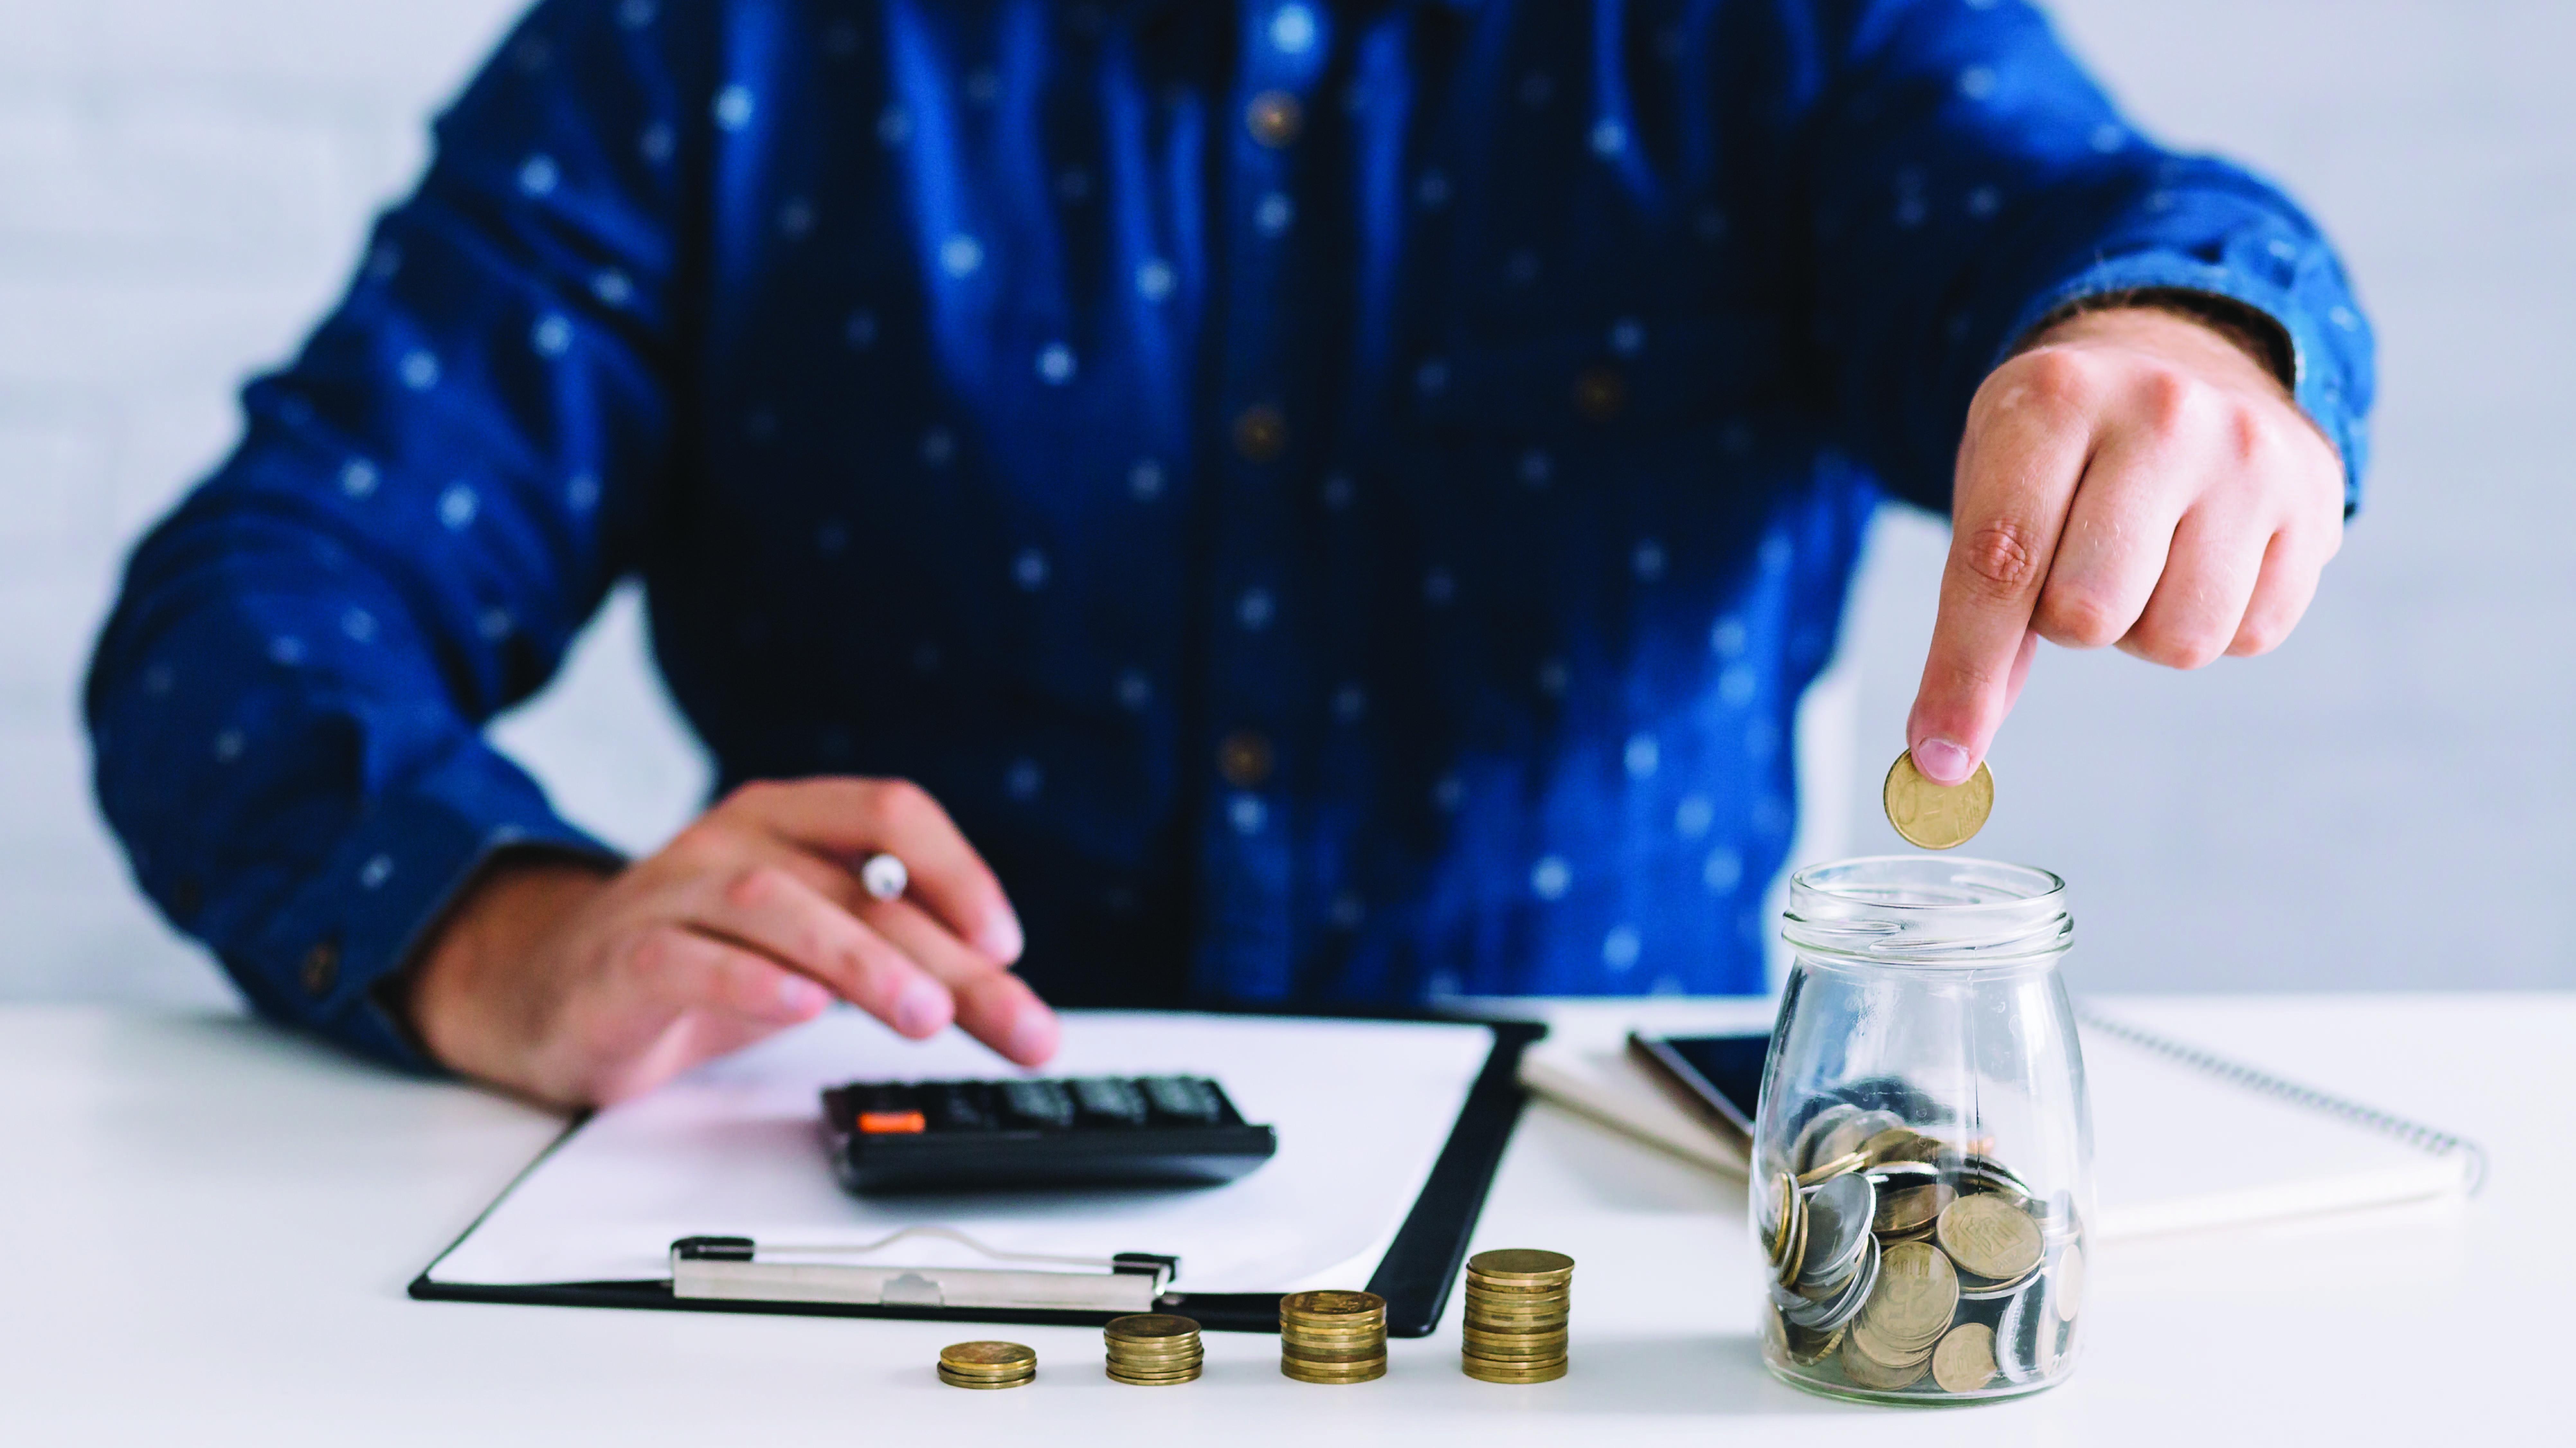 Finding Financial Balance